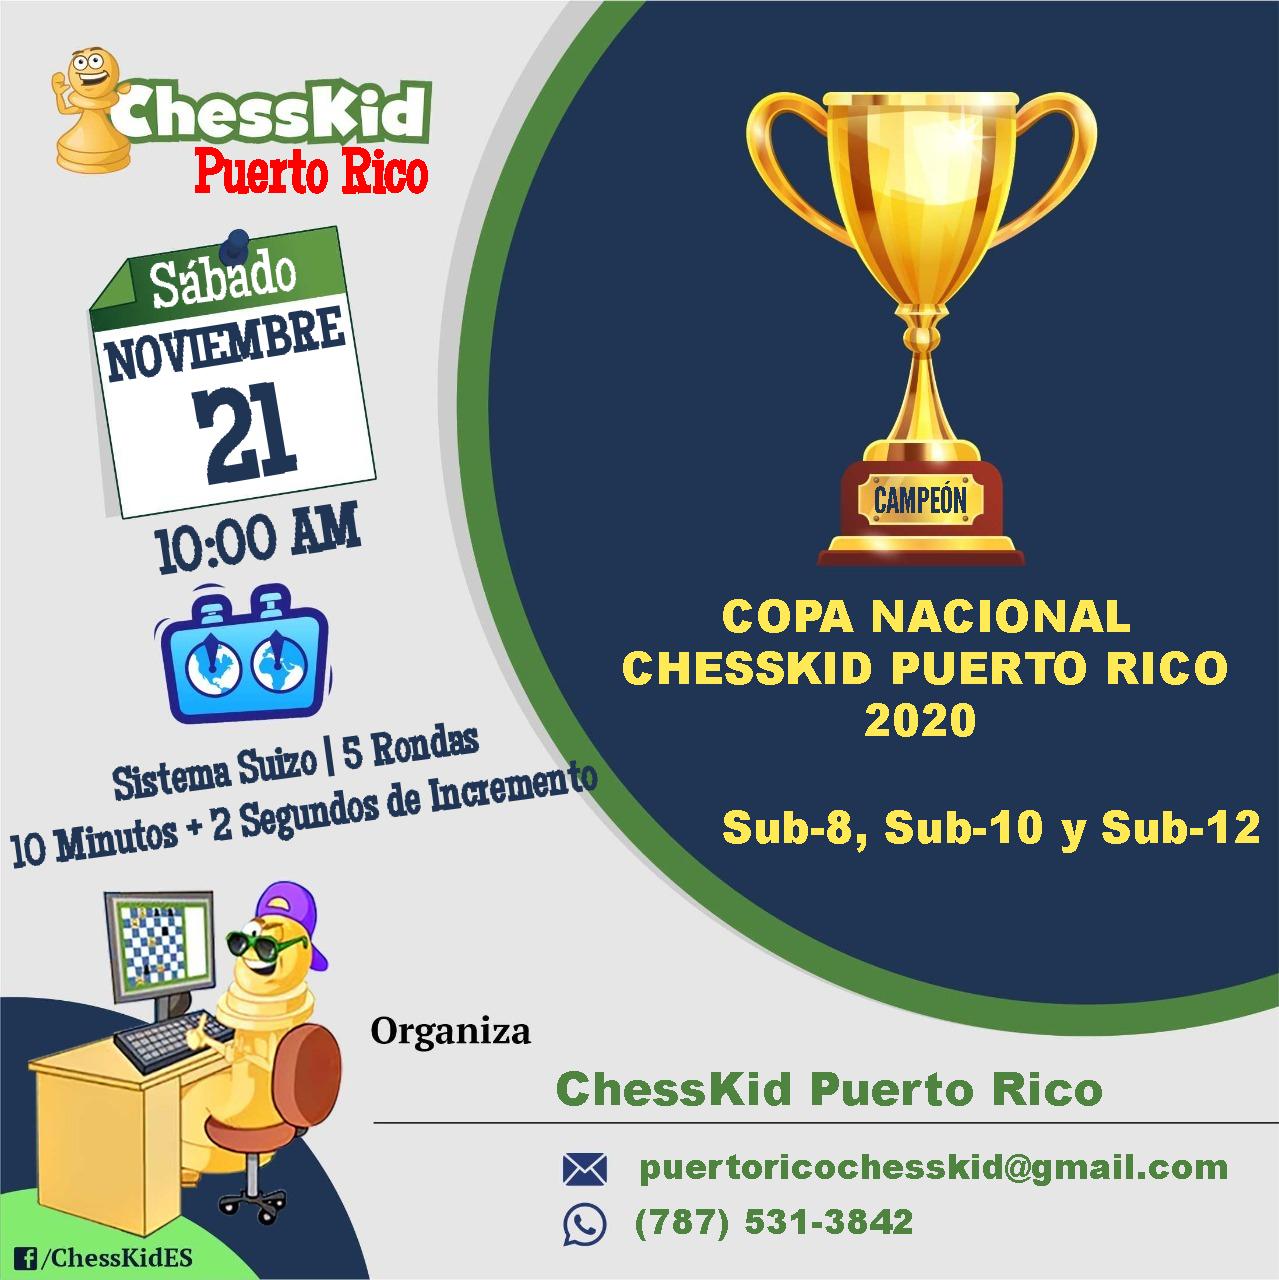 COPA NACIONAL CHESSKID PUERTO RICO 2020